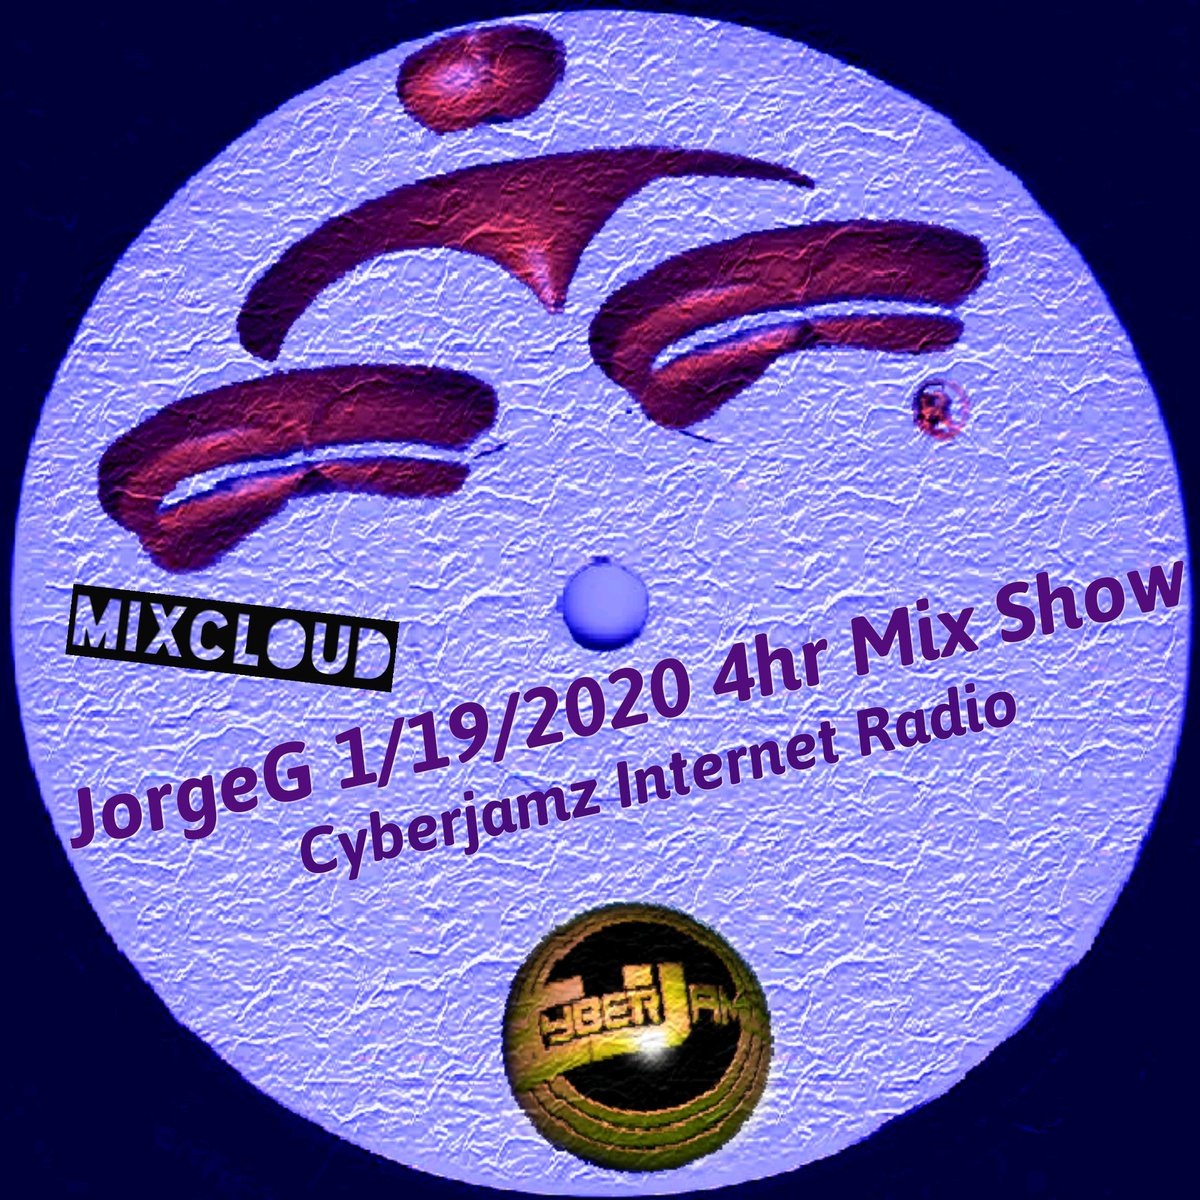 @JorgeG179 ALT #MIXCLOUD LINK My #Sunday 4hr #Mixshow via #Cyberjamz #InternetRadio  https://www.mixcloud.com/JorgeGee/1122020-curious-jorge-g-show-4hr-mix-set-via-cyberjamz-internet-radio… #Deephouse #Soulfulhouse #Garagehouse #Afrohouse #Housemusic #Techhouse #Techno #Dance #Global #NuDisco #Disco #Funky #Dance #Mashups #Dj #MiamiSet